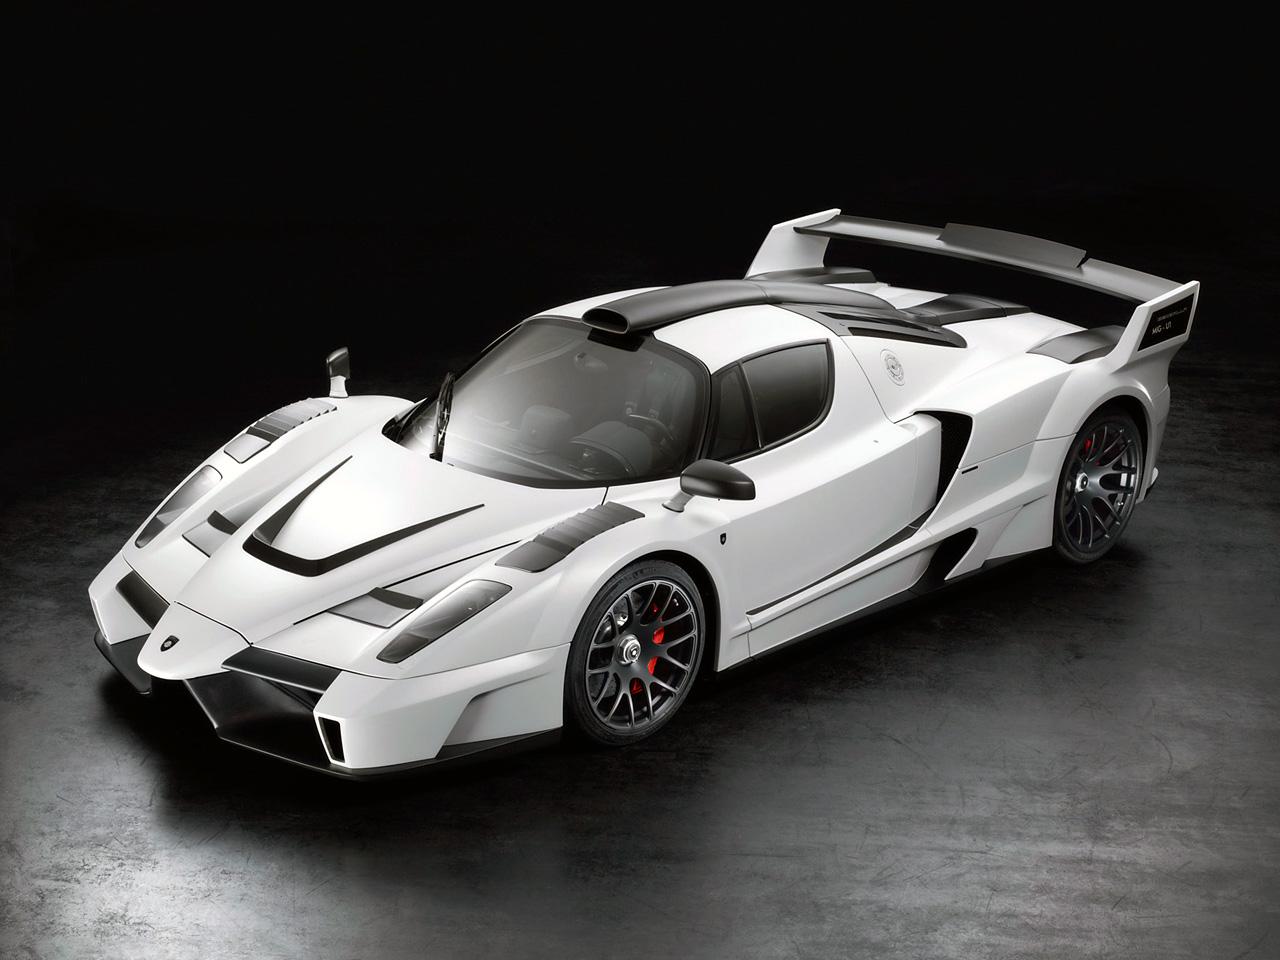 Modifikasi Mobil Sport Ferrari